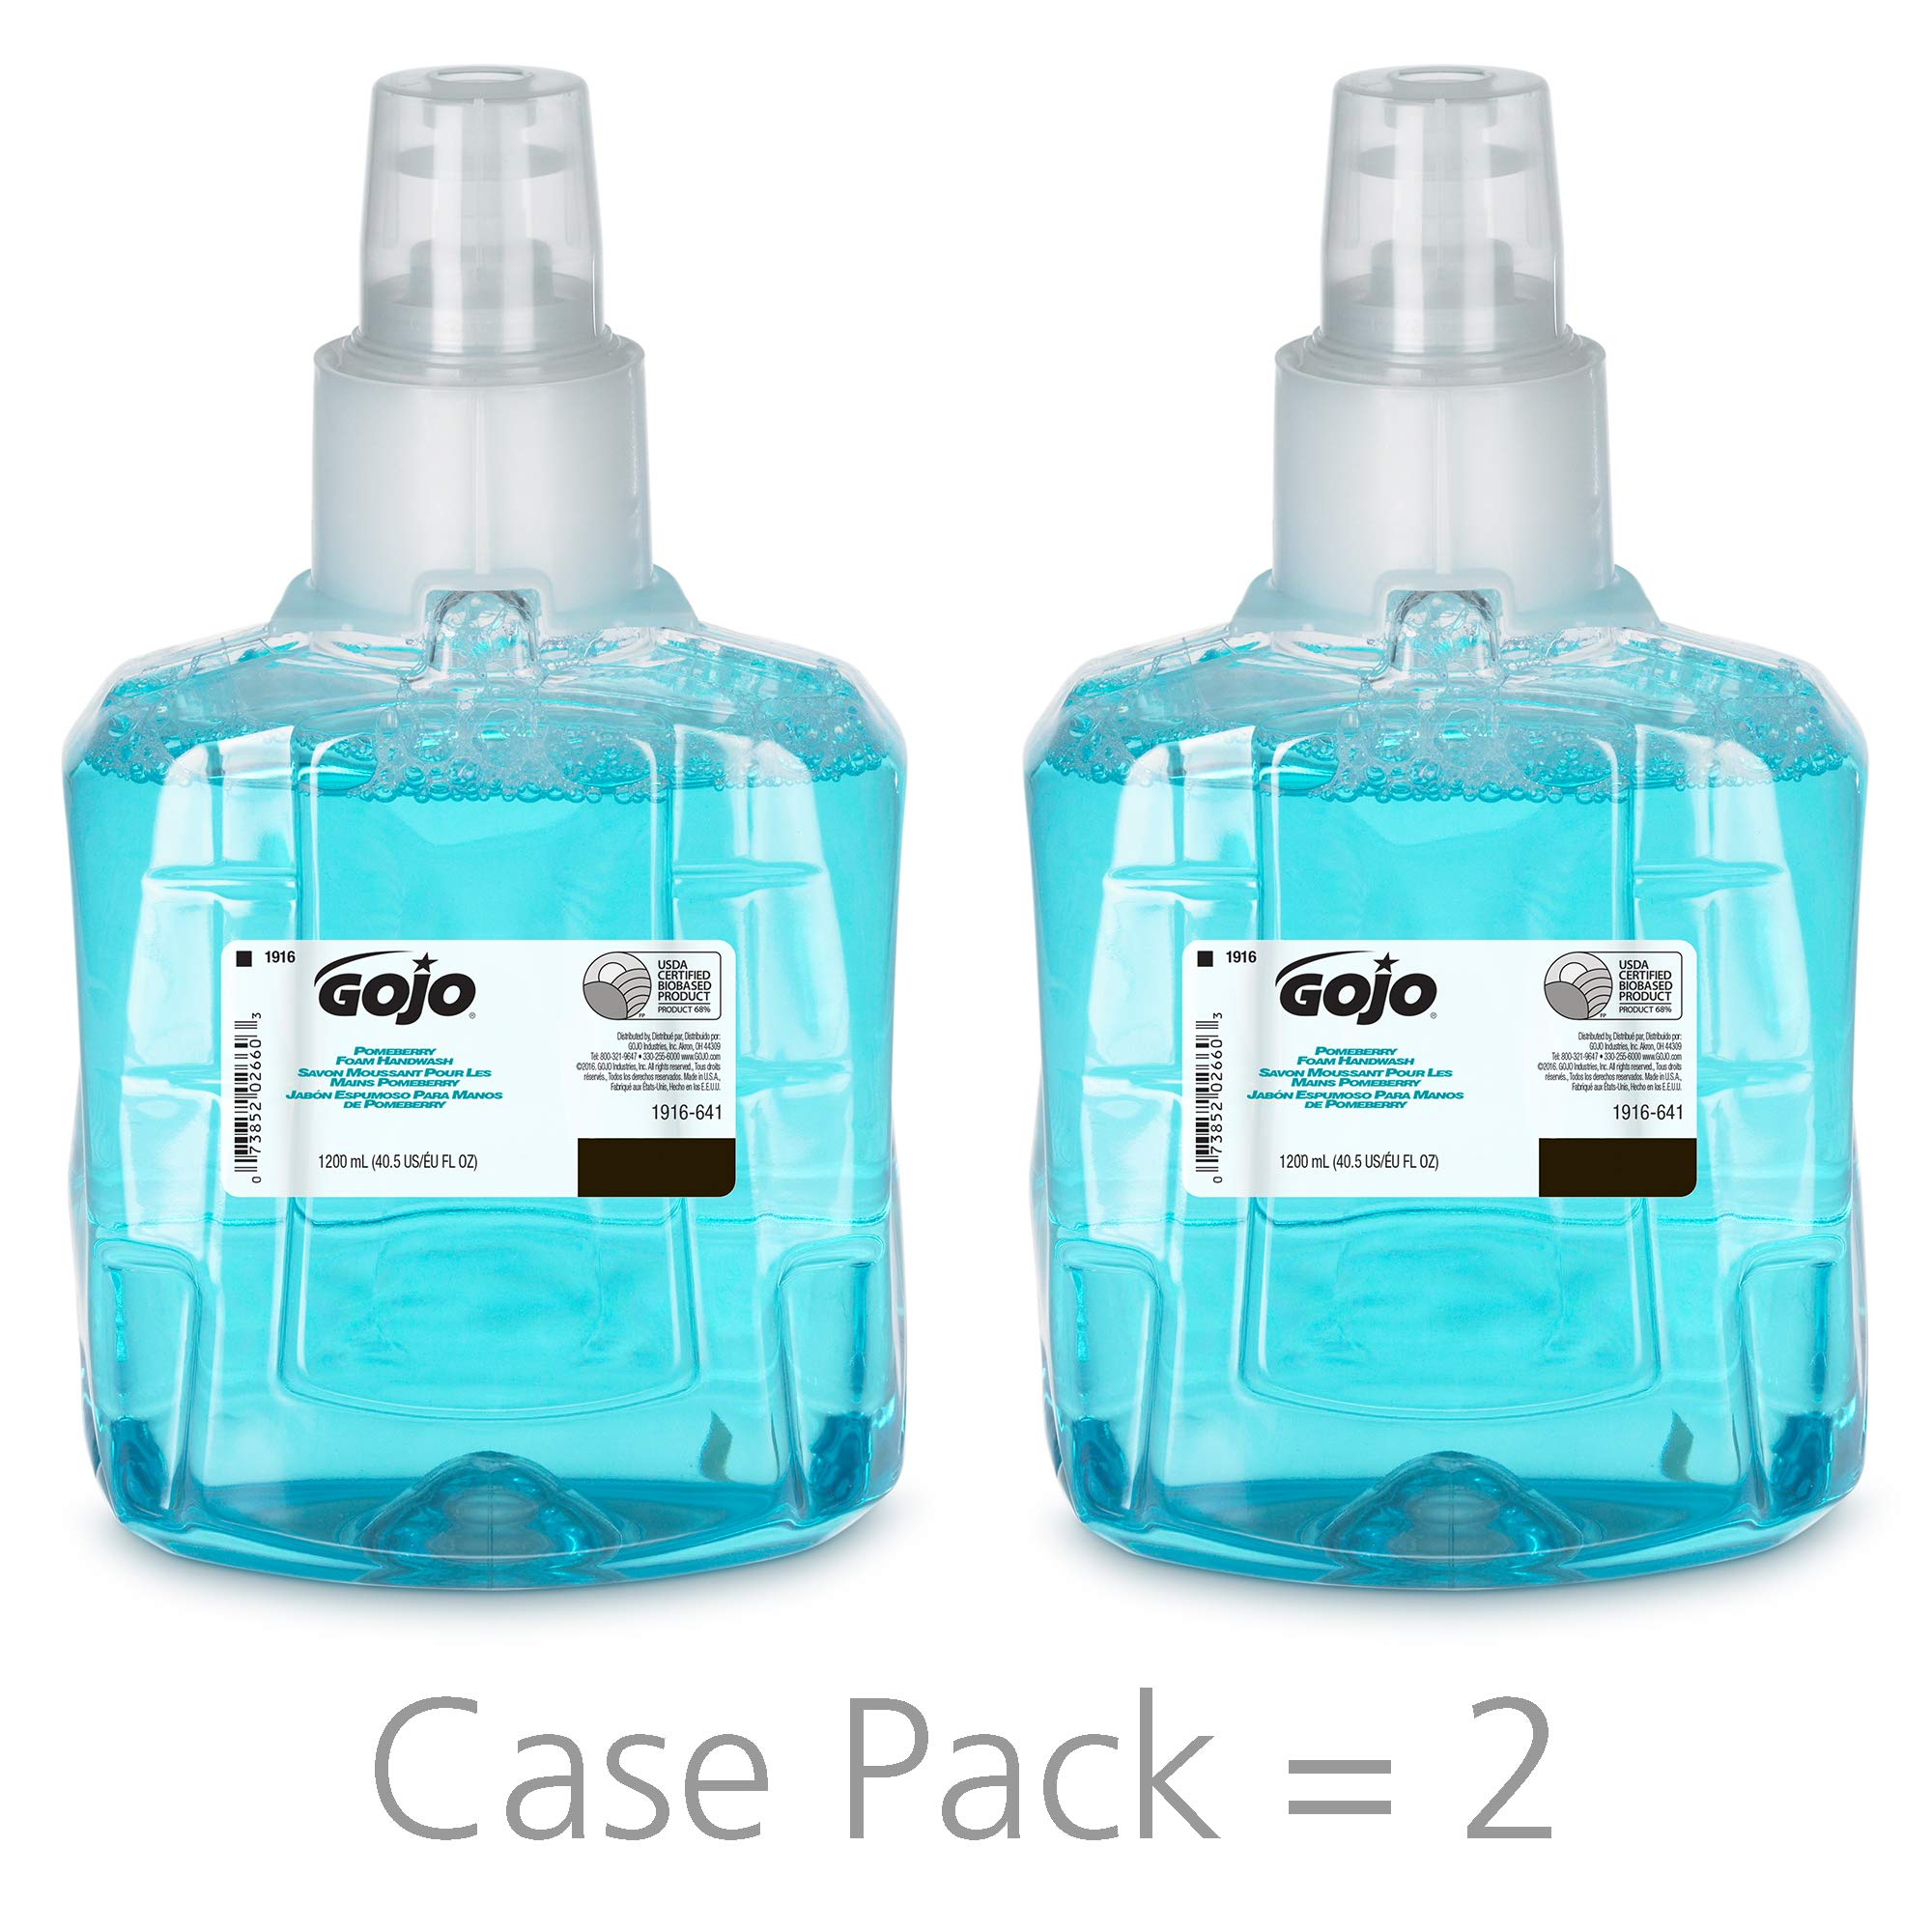 GOJO Pomeberry Foam Handwash, Pomegranate Scent, 1200 mL Hand Soap Refill for GOJO LTX-12 Dispenser (Pack of 2) - 1916-02 by Gojo